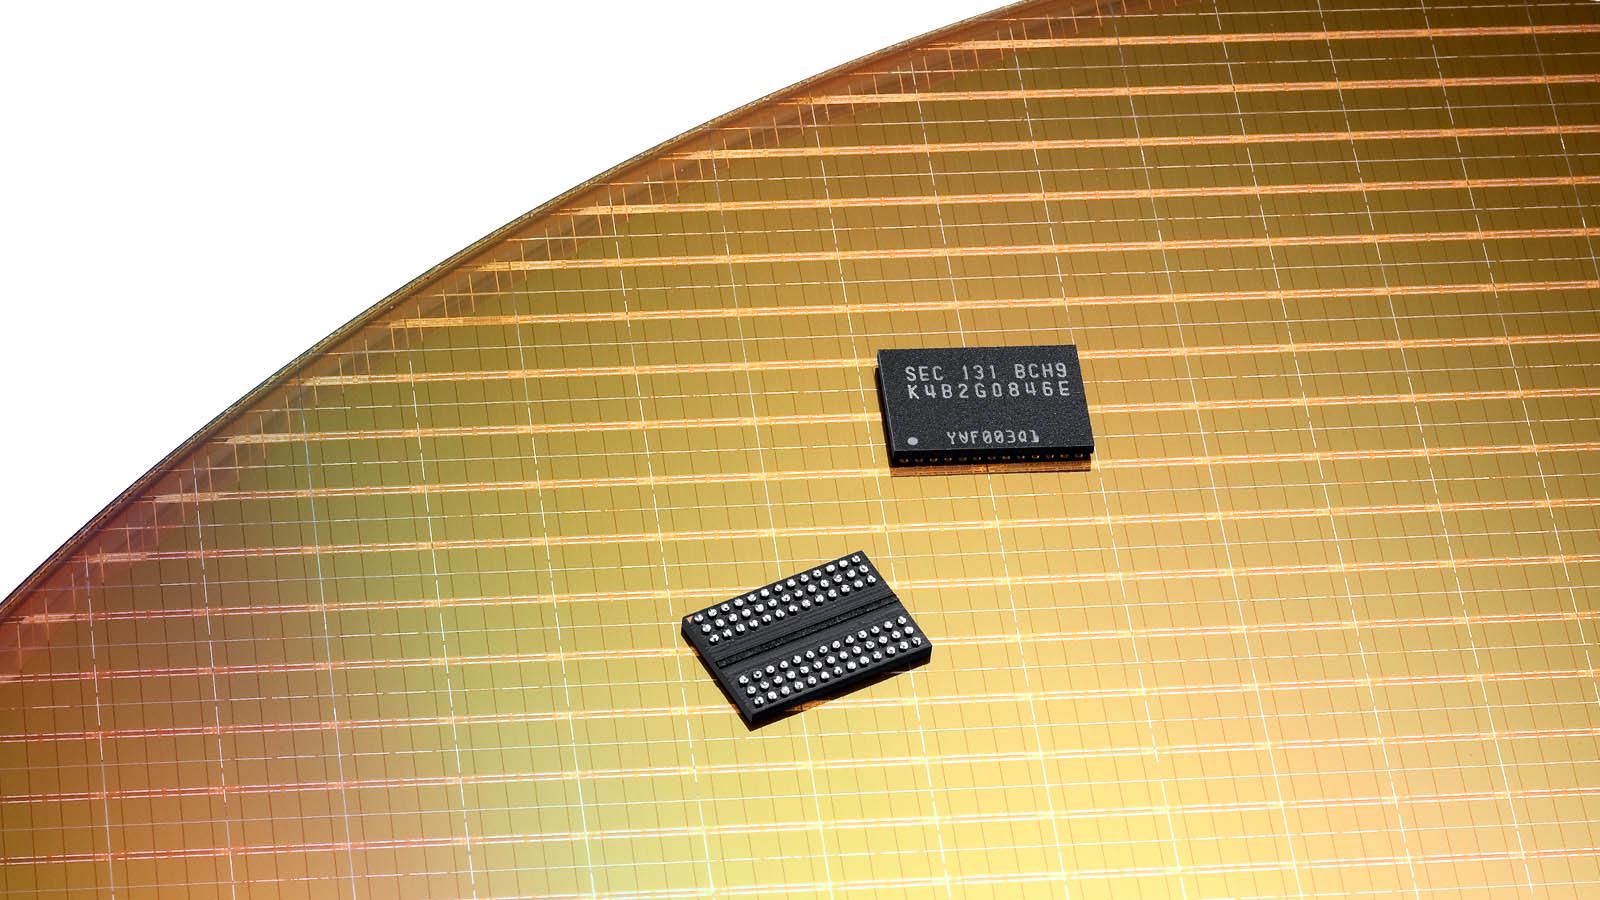 Samsung confirma el desarrollo de chips de 8 Gb de LPDDR5 a 10 nm 43